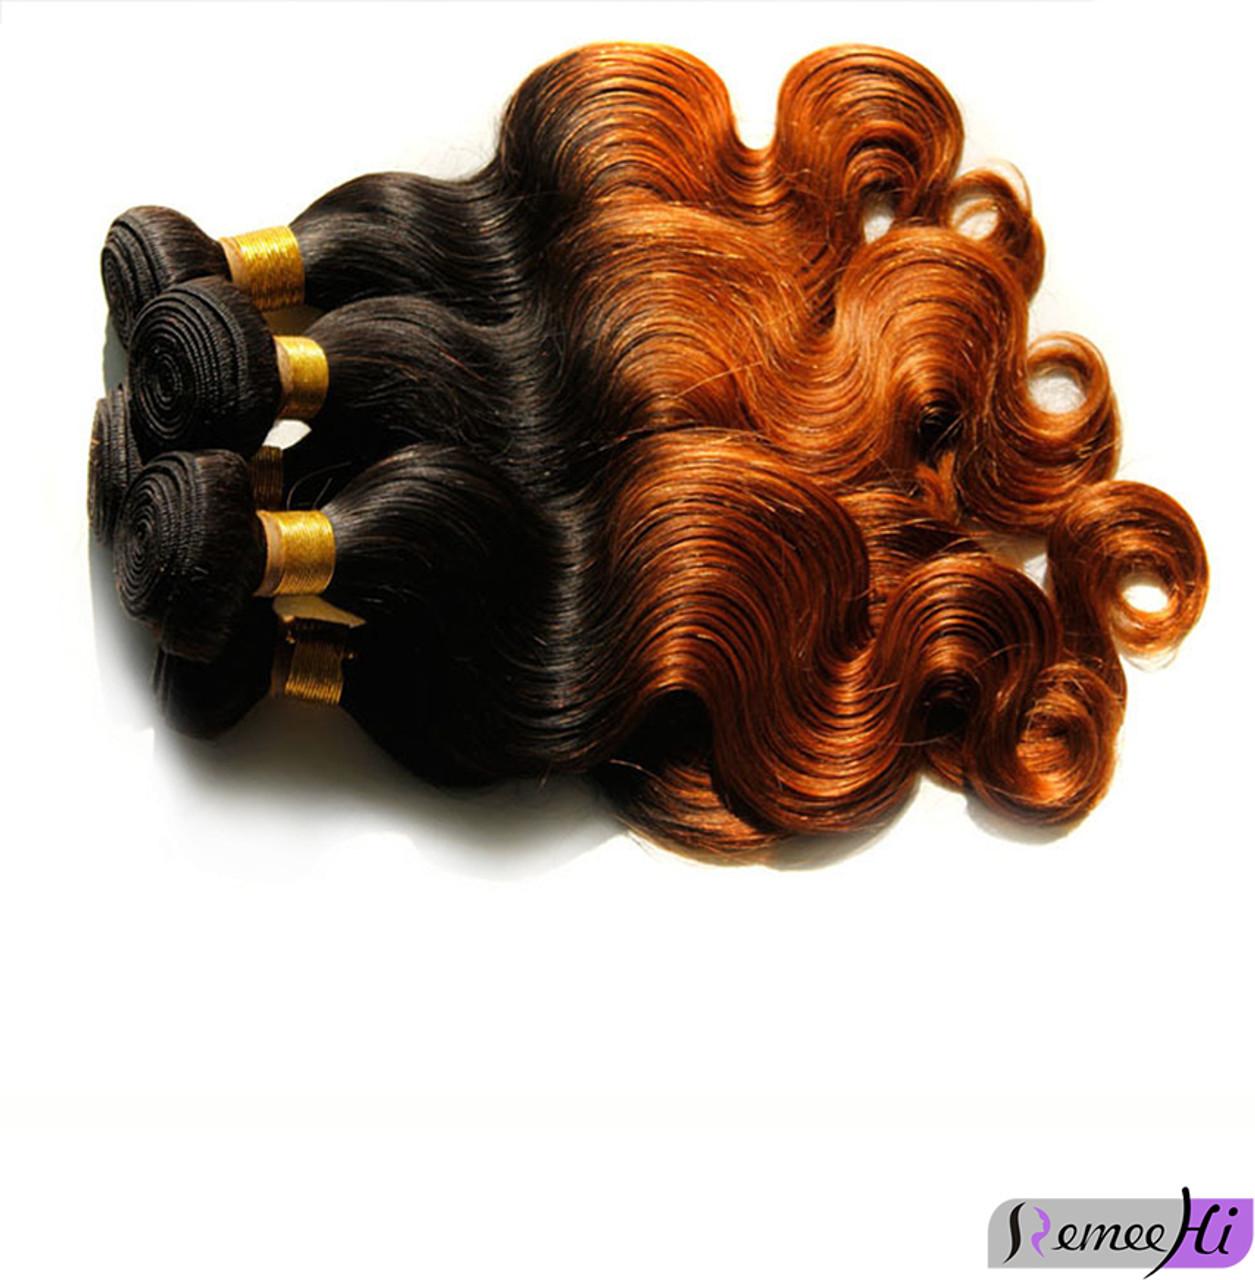 Remeehi Brazilian Virgin Human Hair Weft Body Wave Ombre Hair